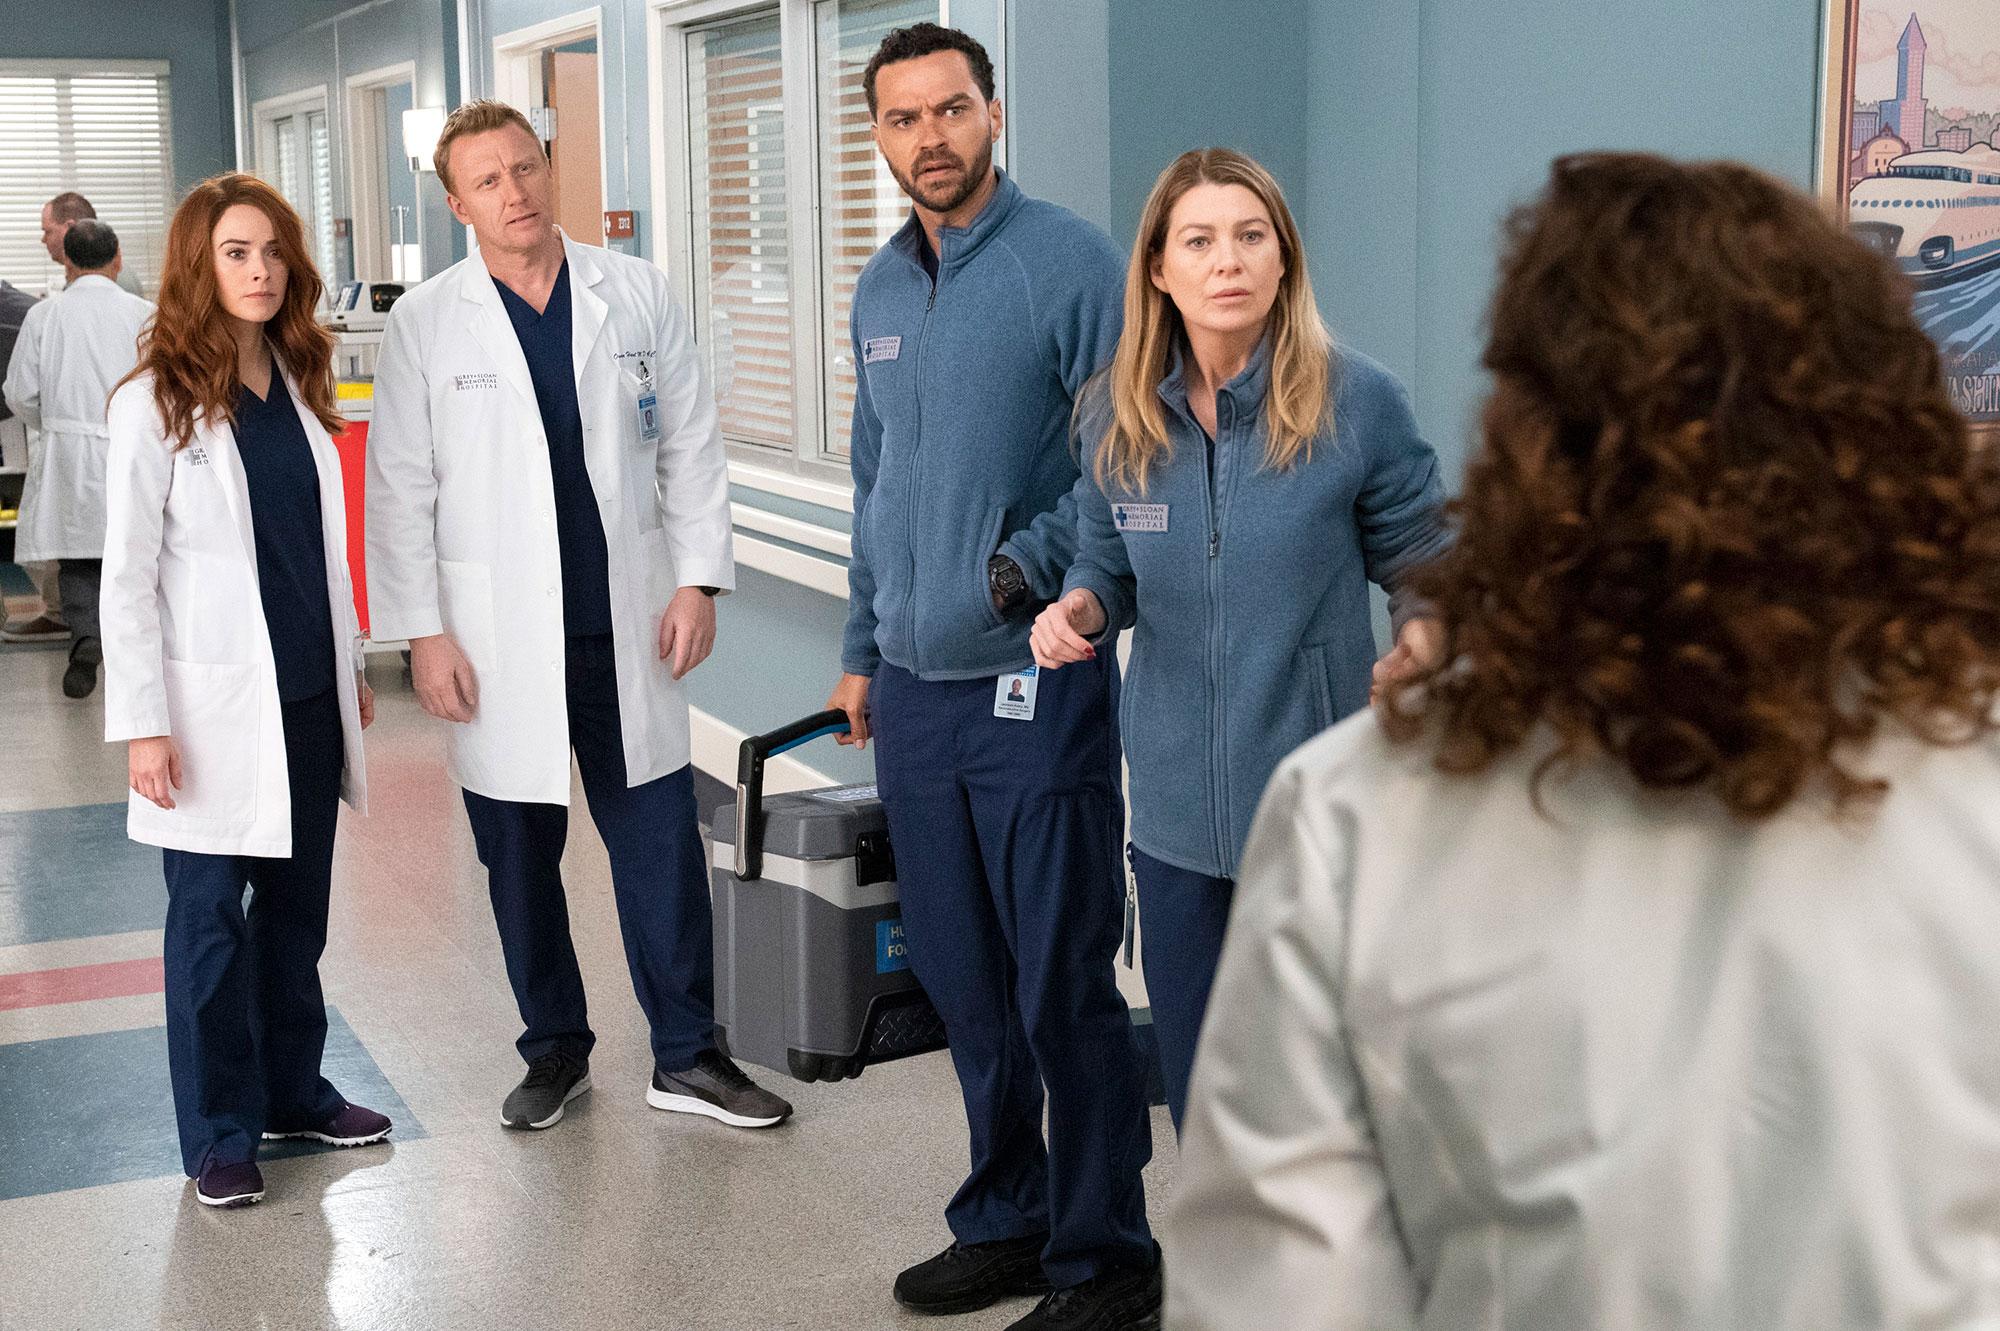 Greys Anatomy - Abigail Spencer, Kevin McKidd, Jesse Williams, and Ellen Pompeo in 'Grey's Anatomy.